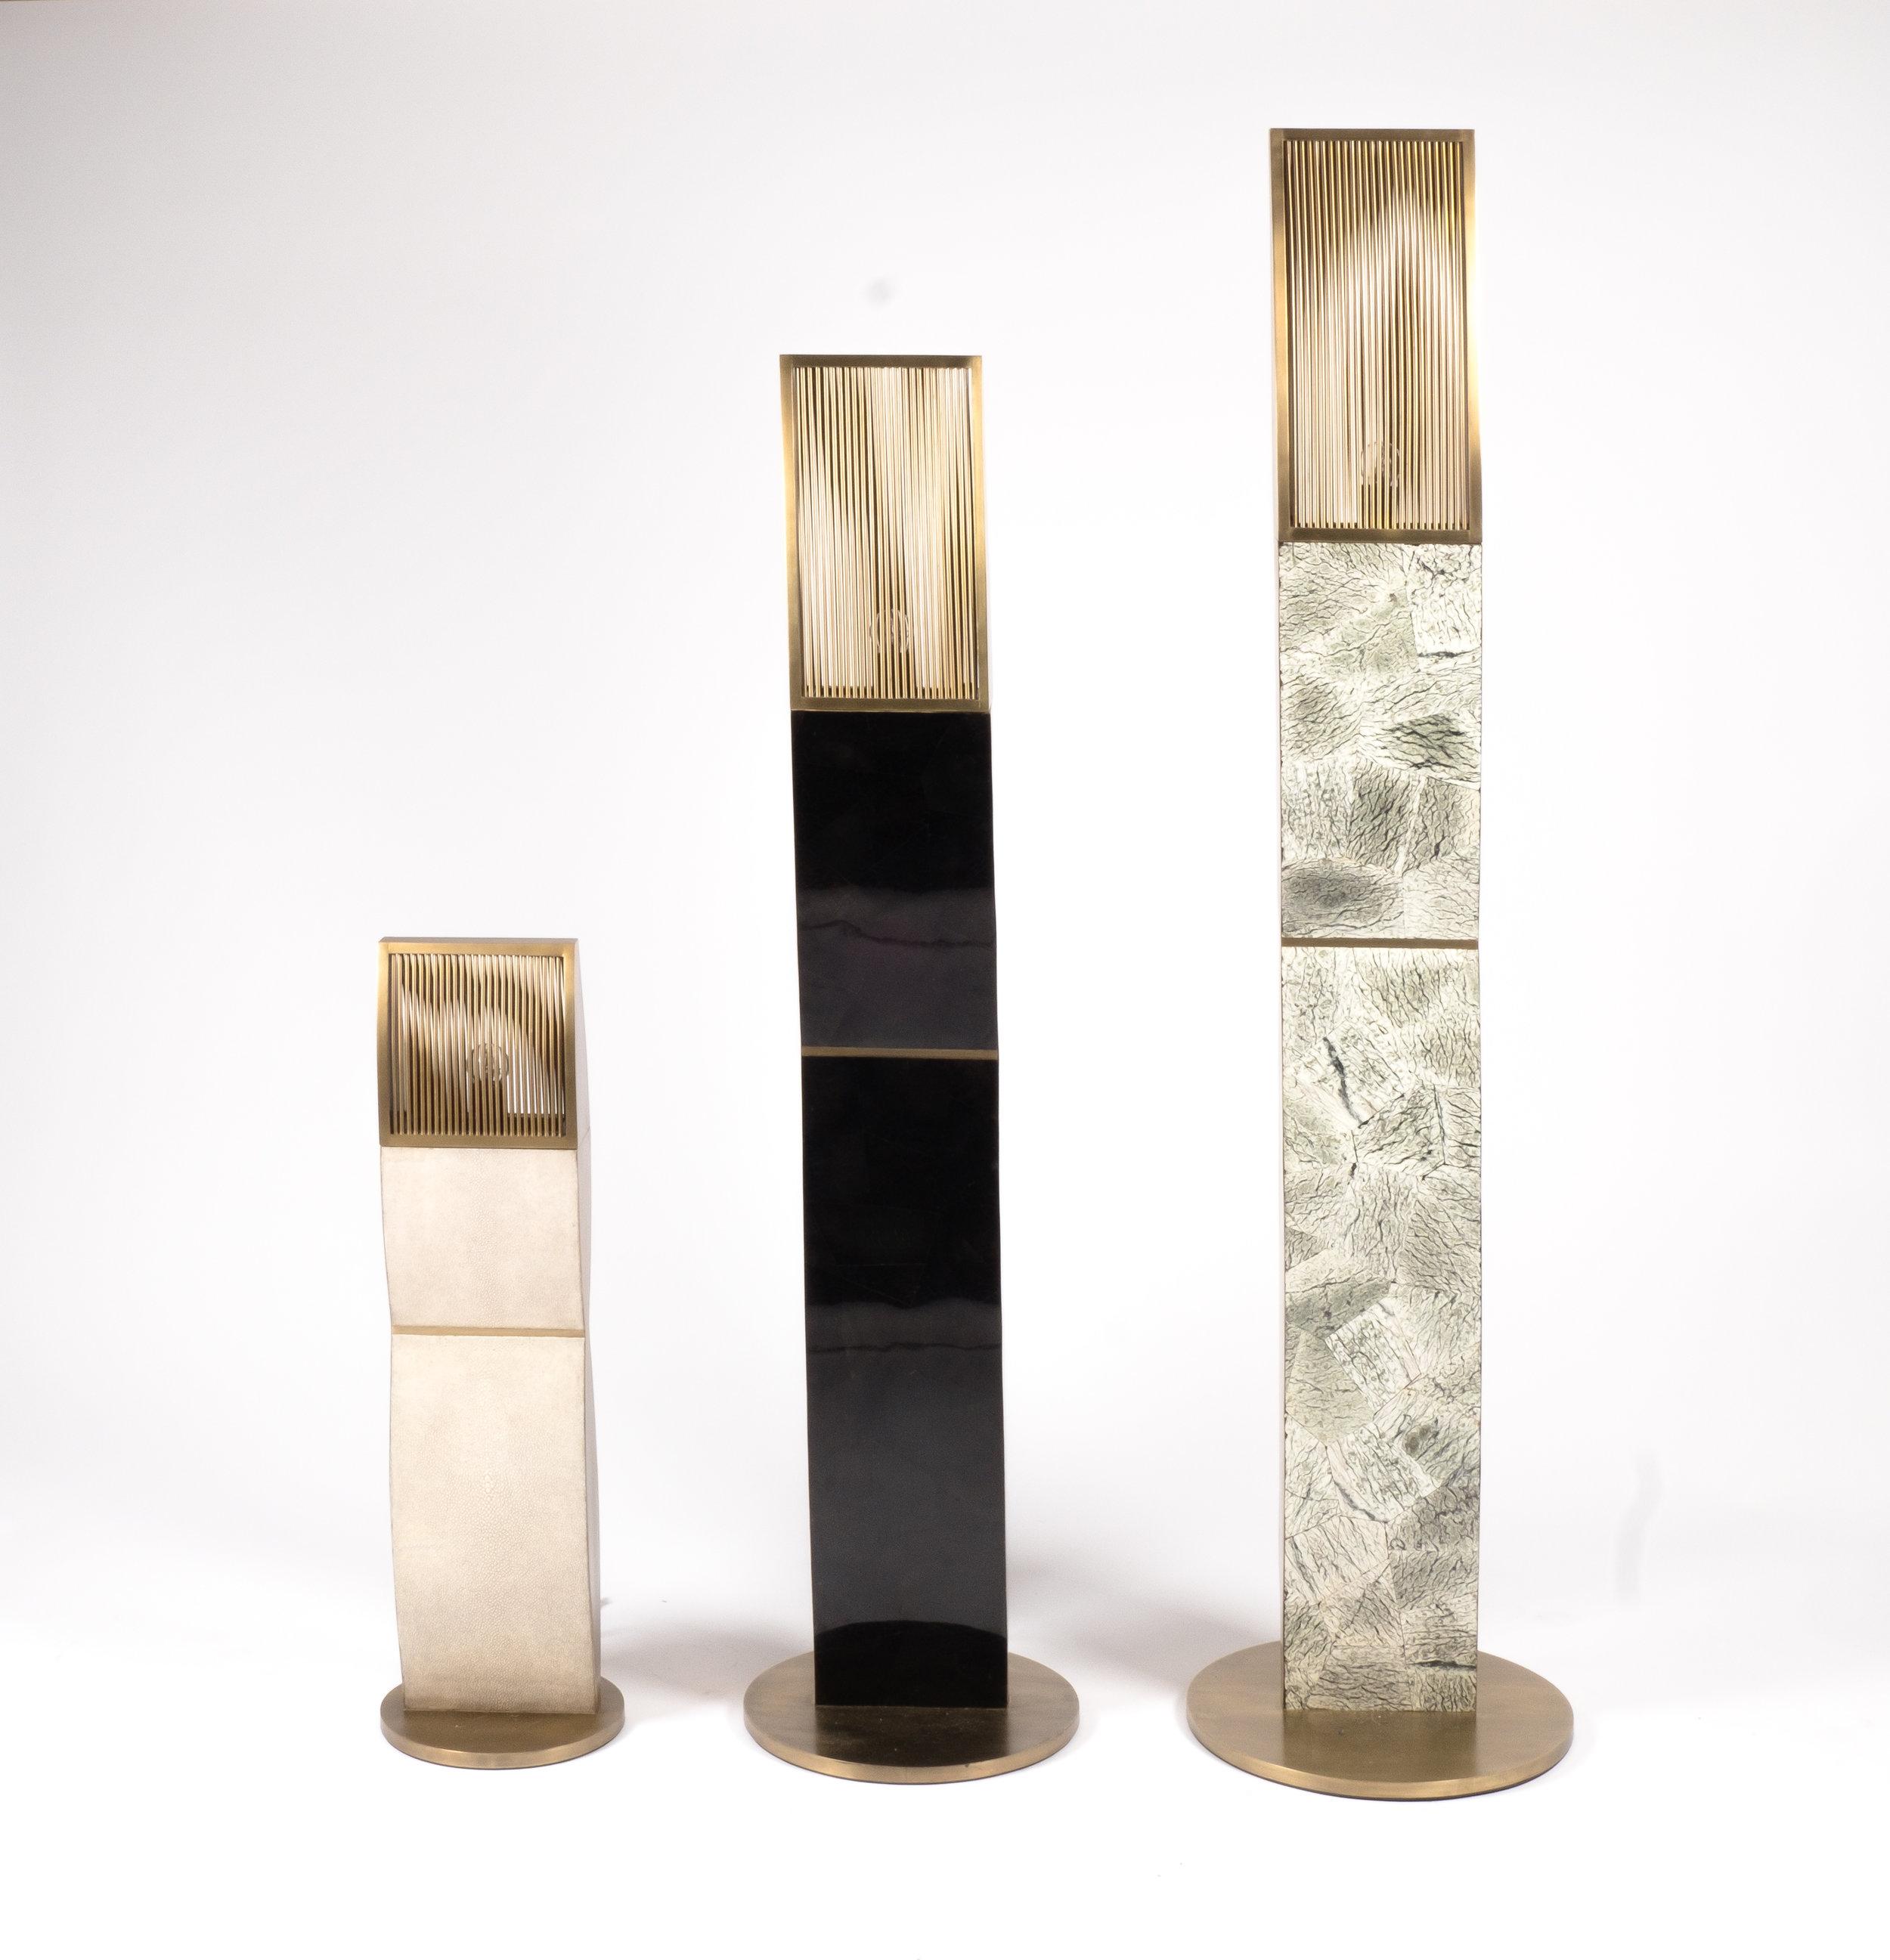 kifu-paris-lamps-black-penshell-shell-baguio-stone-shagreen-brass-metal